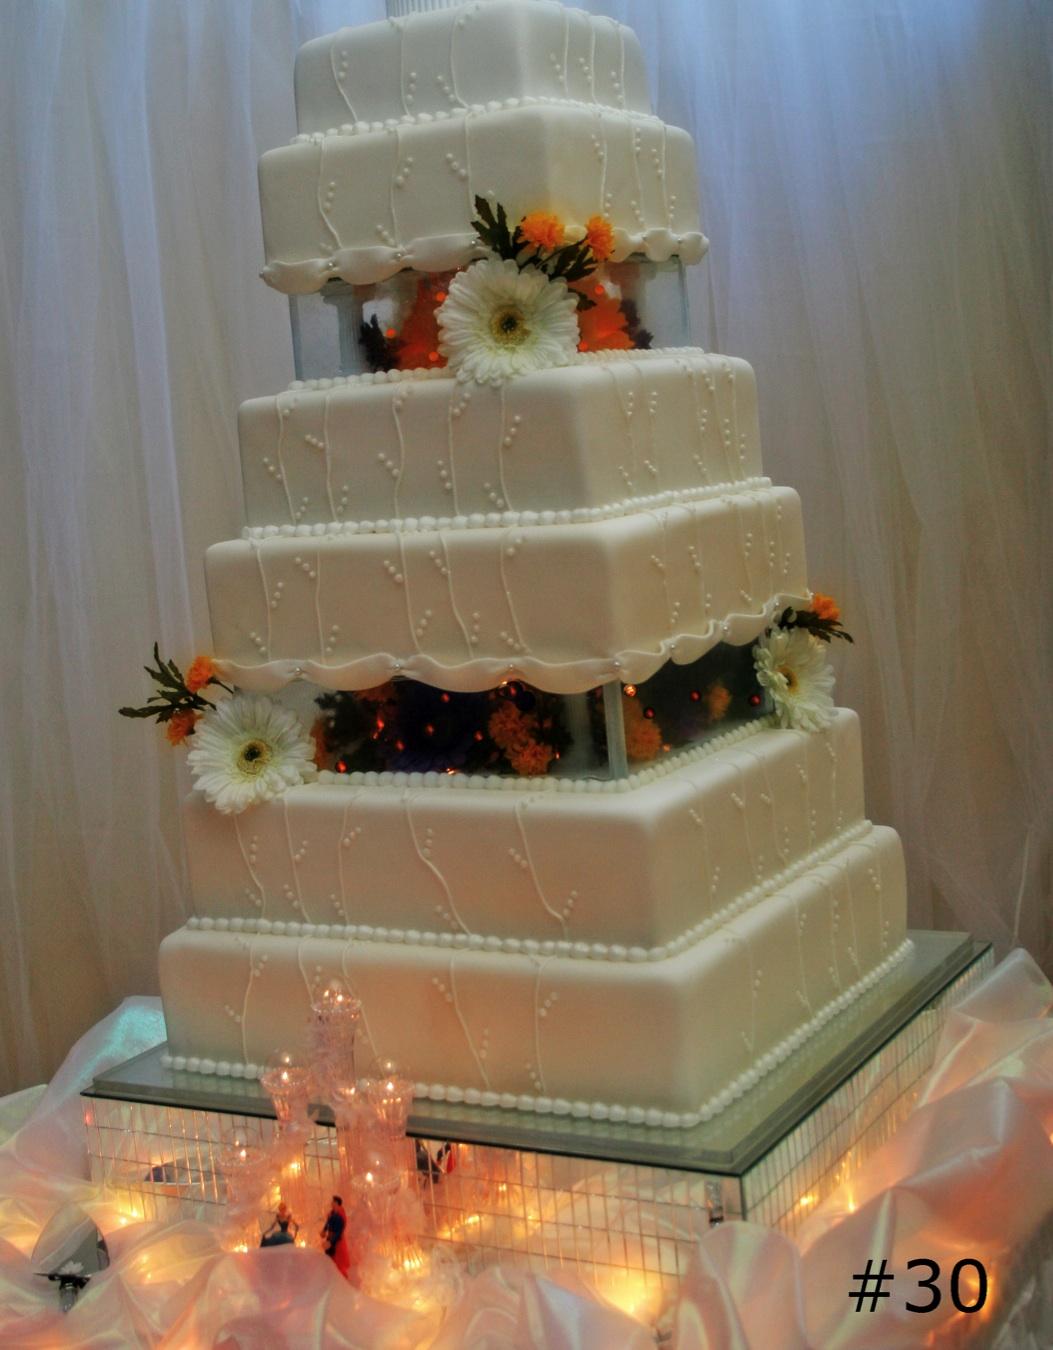 st george utah wedding cakes. Black Bedroom Furniture Sets. Home Design Ideas